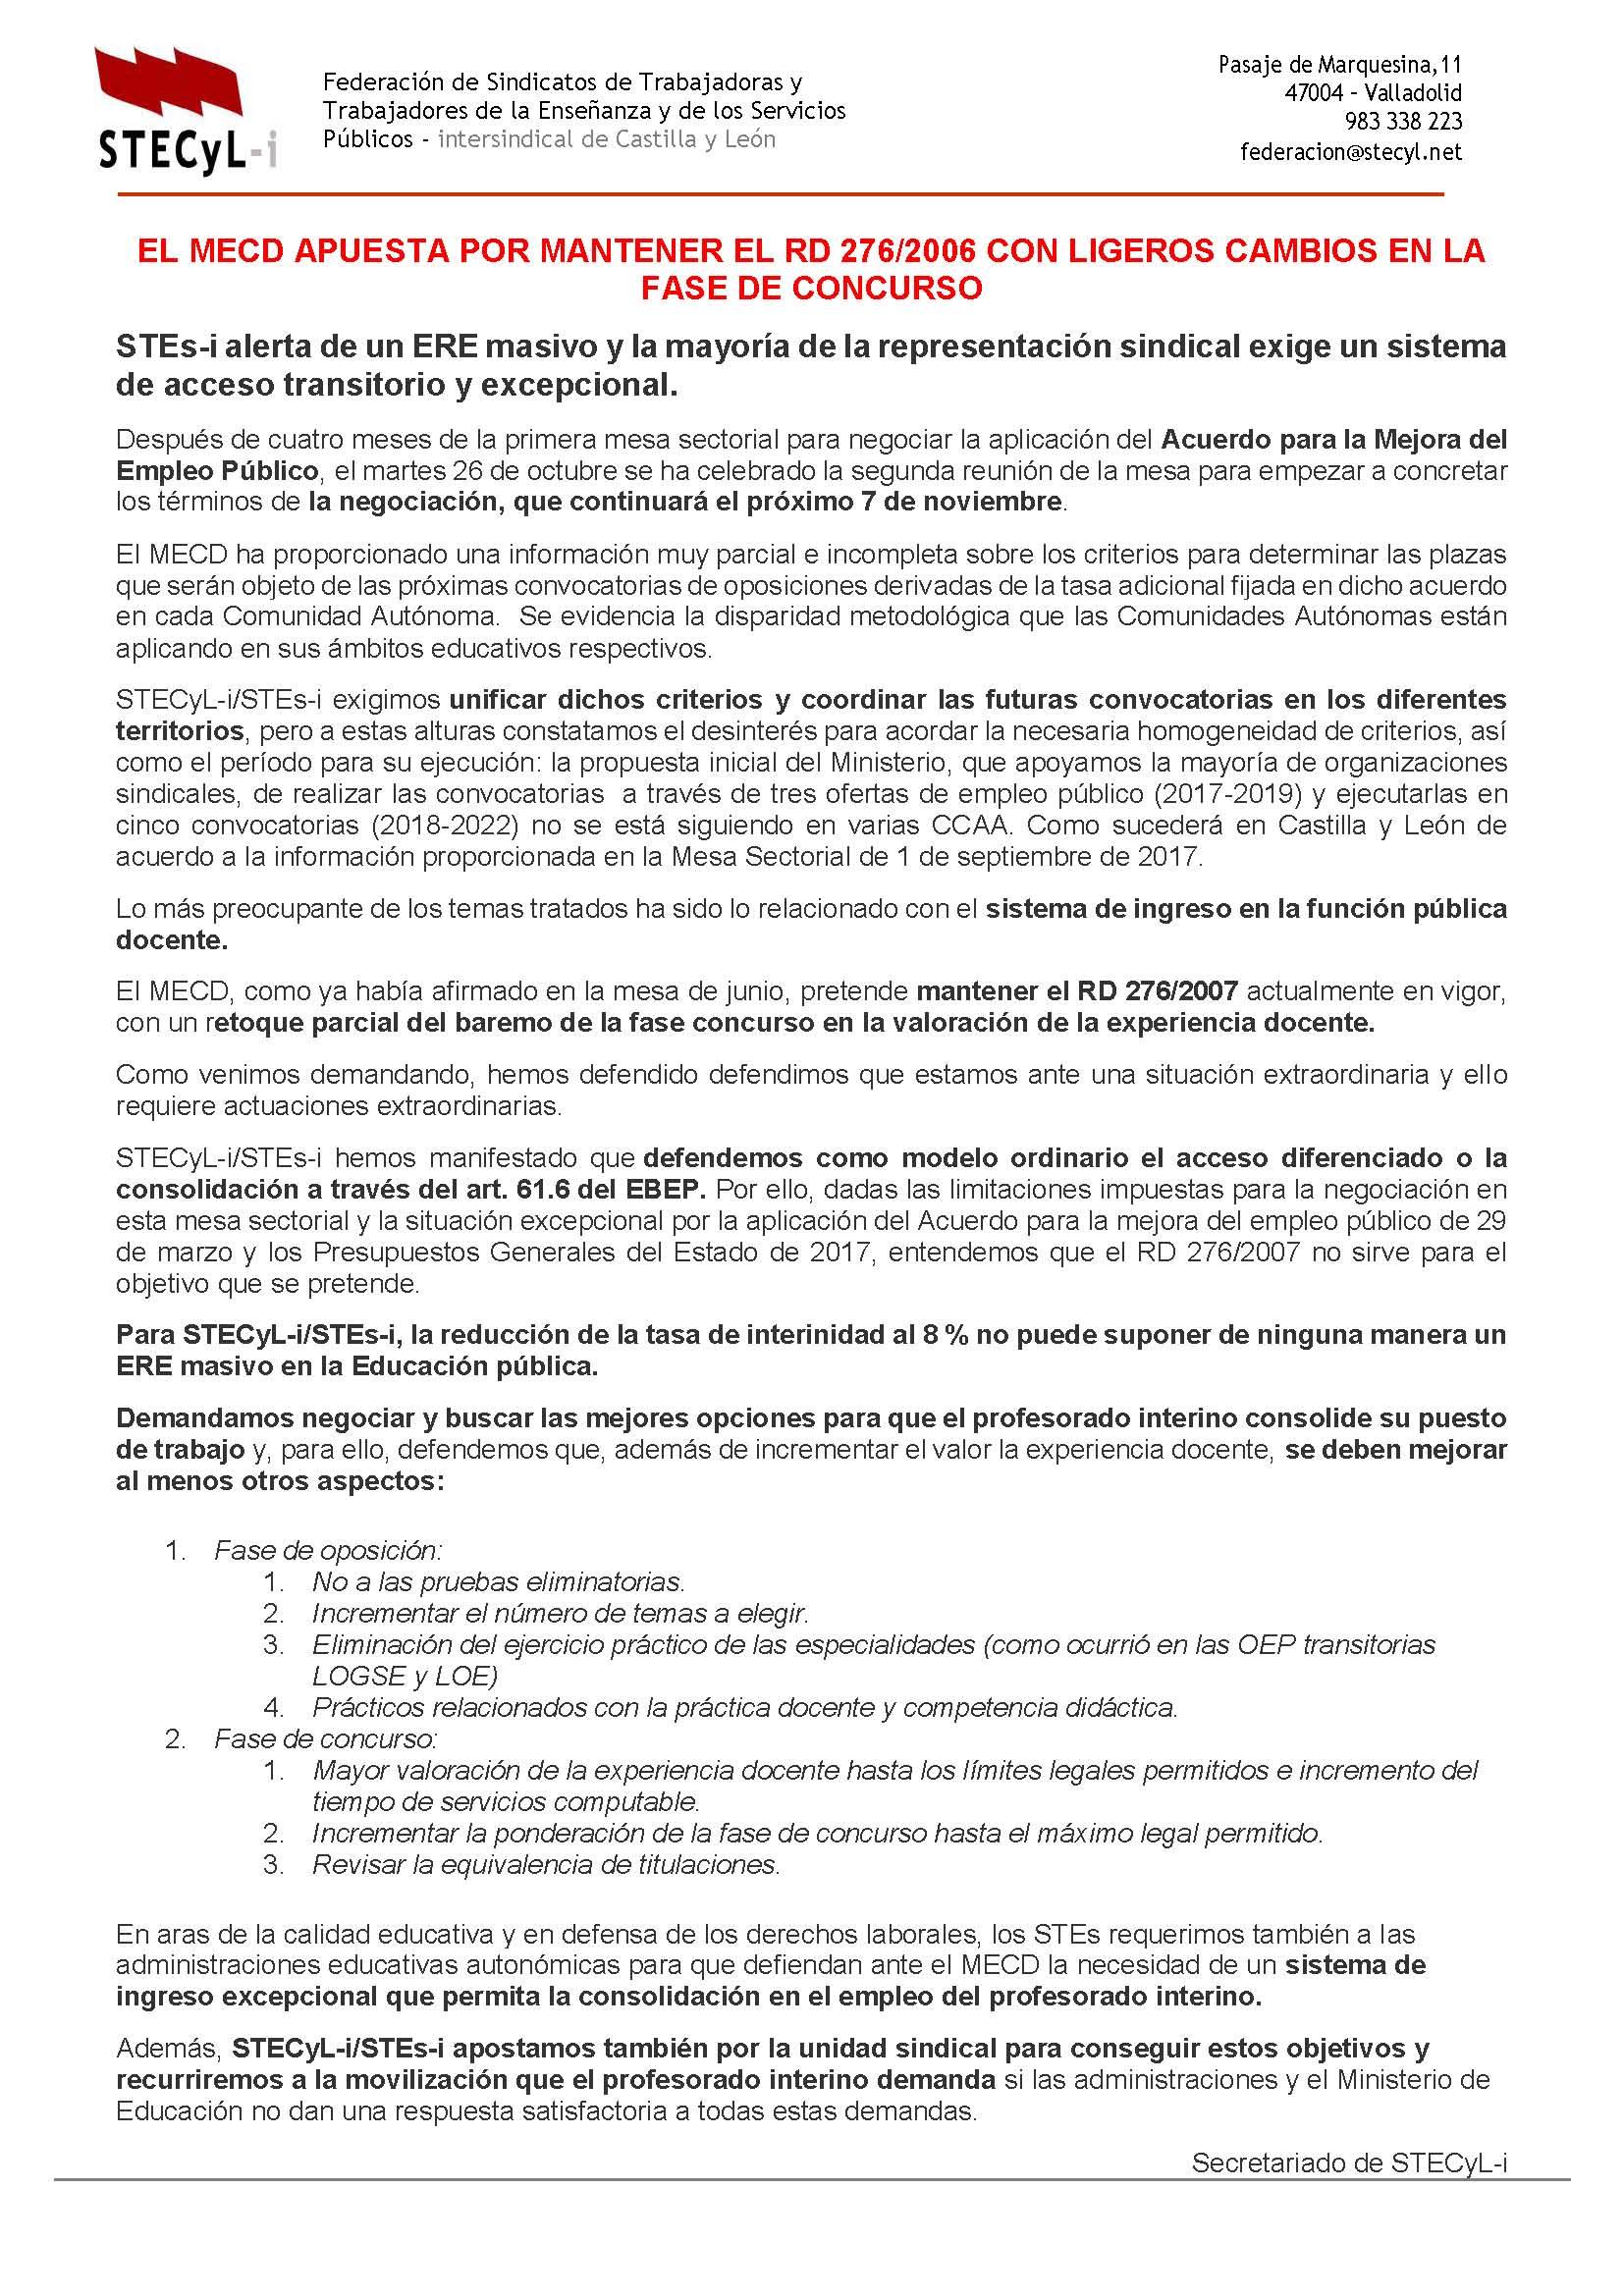 Profesorado-Interino-Negociacion-Estabilizacion-Empleo-Stecyl-i